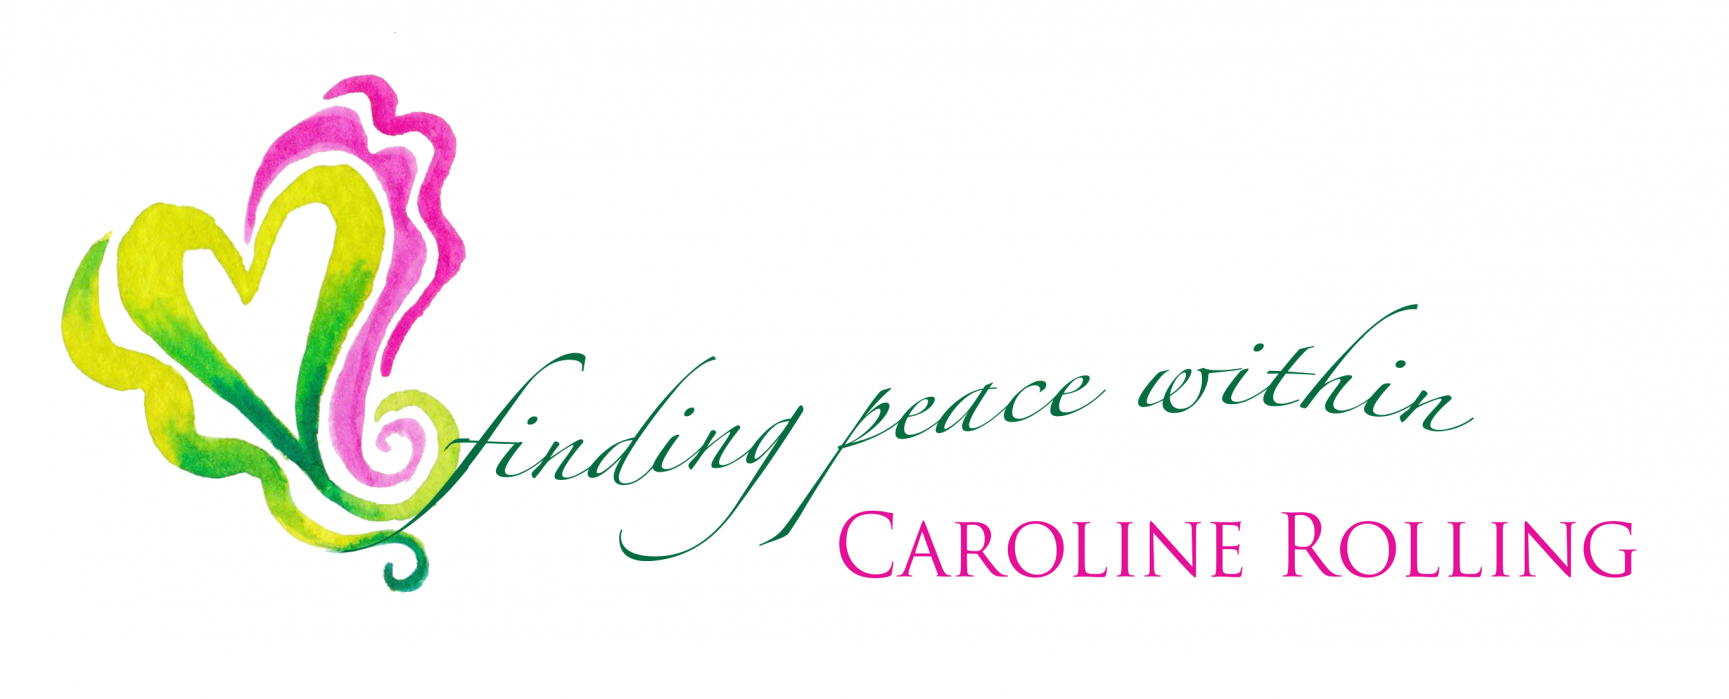 Caroline Rolling